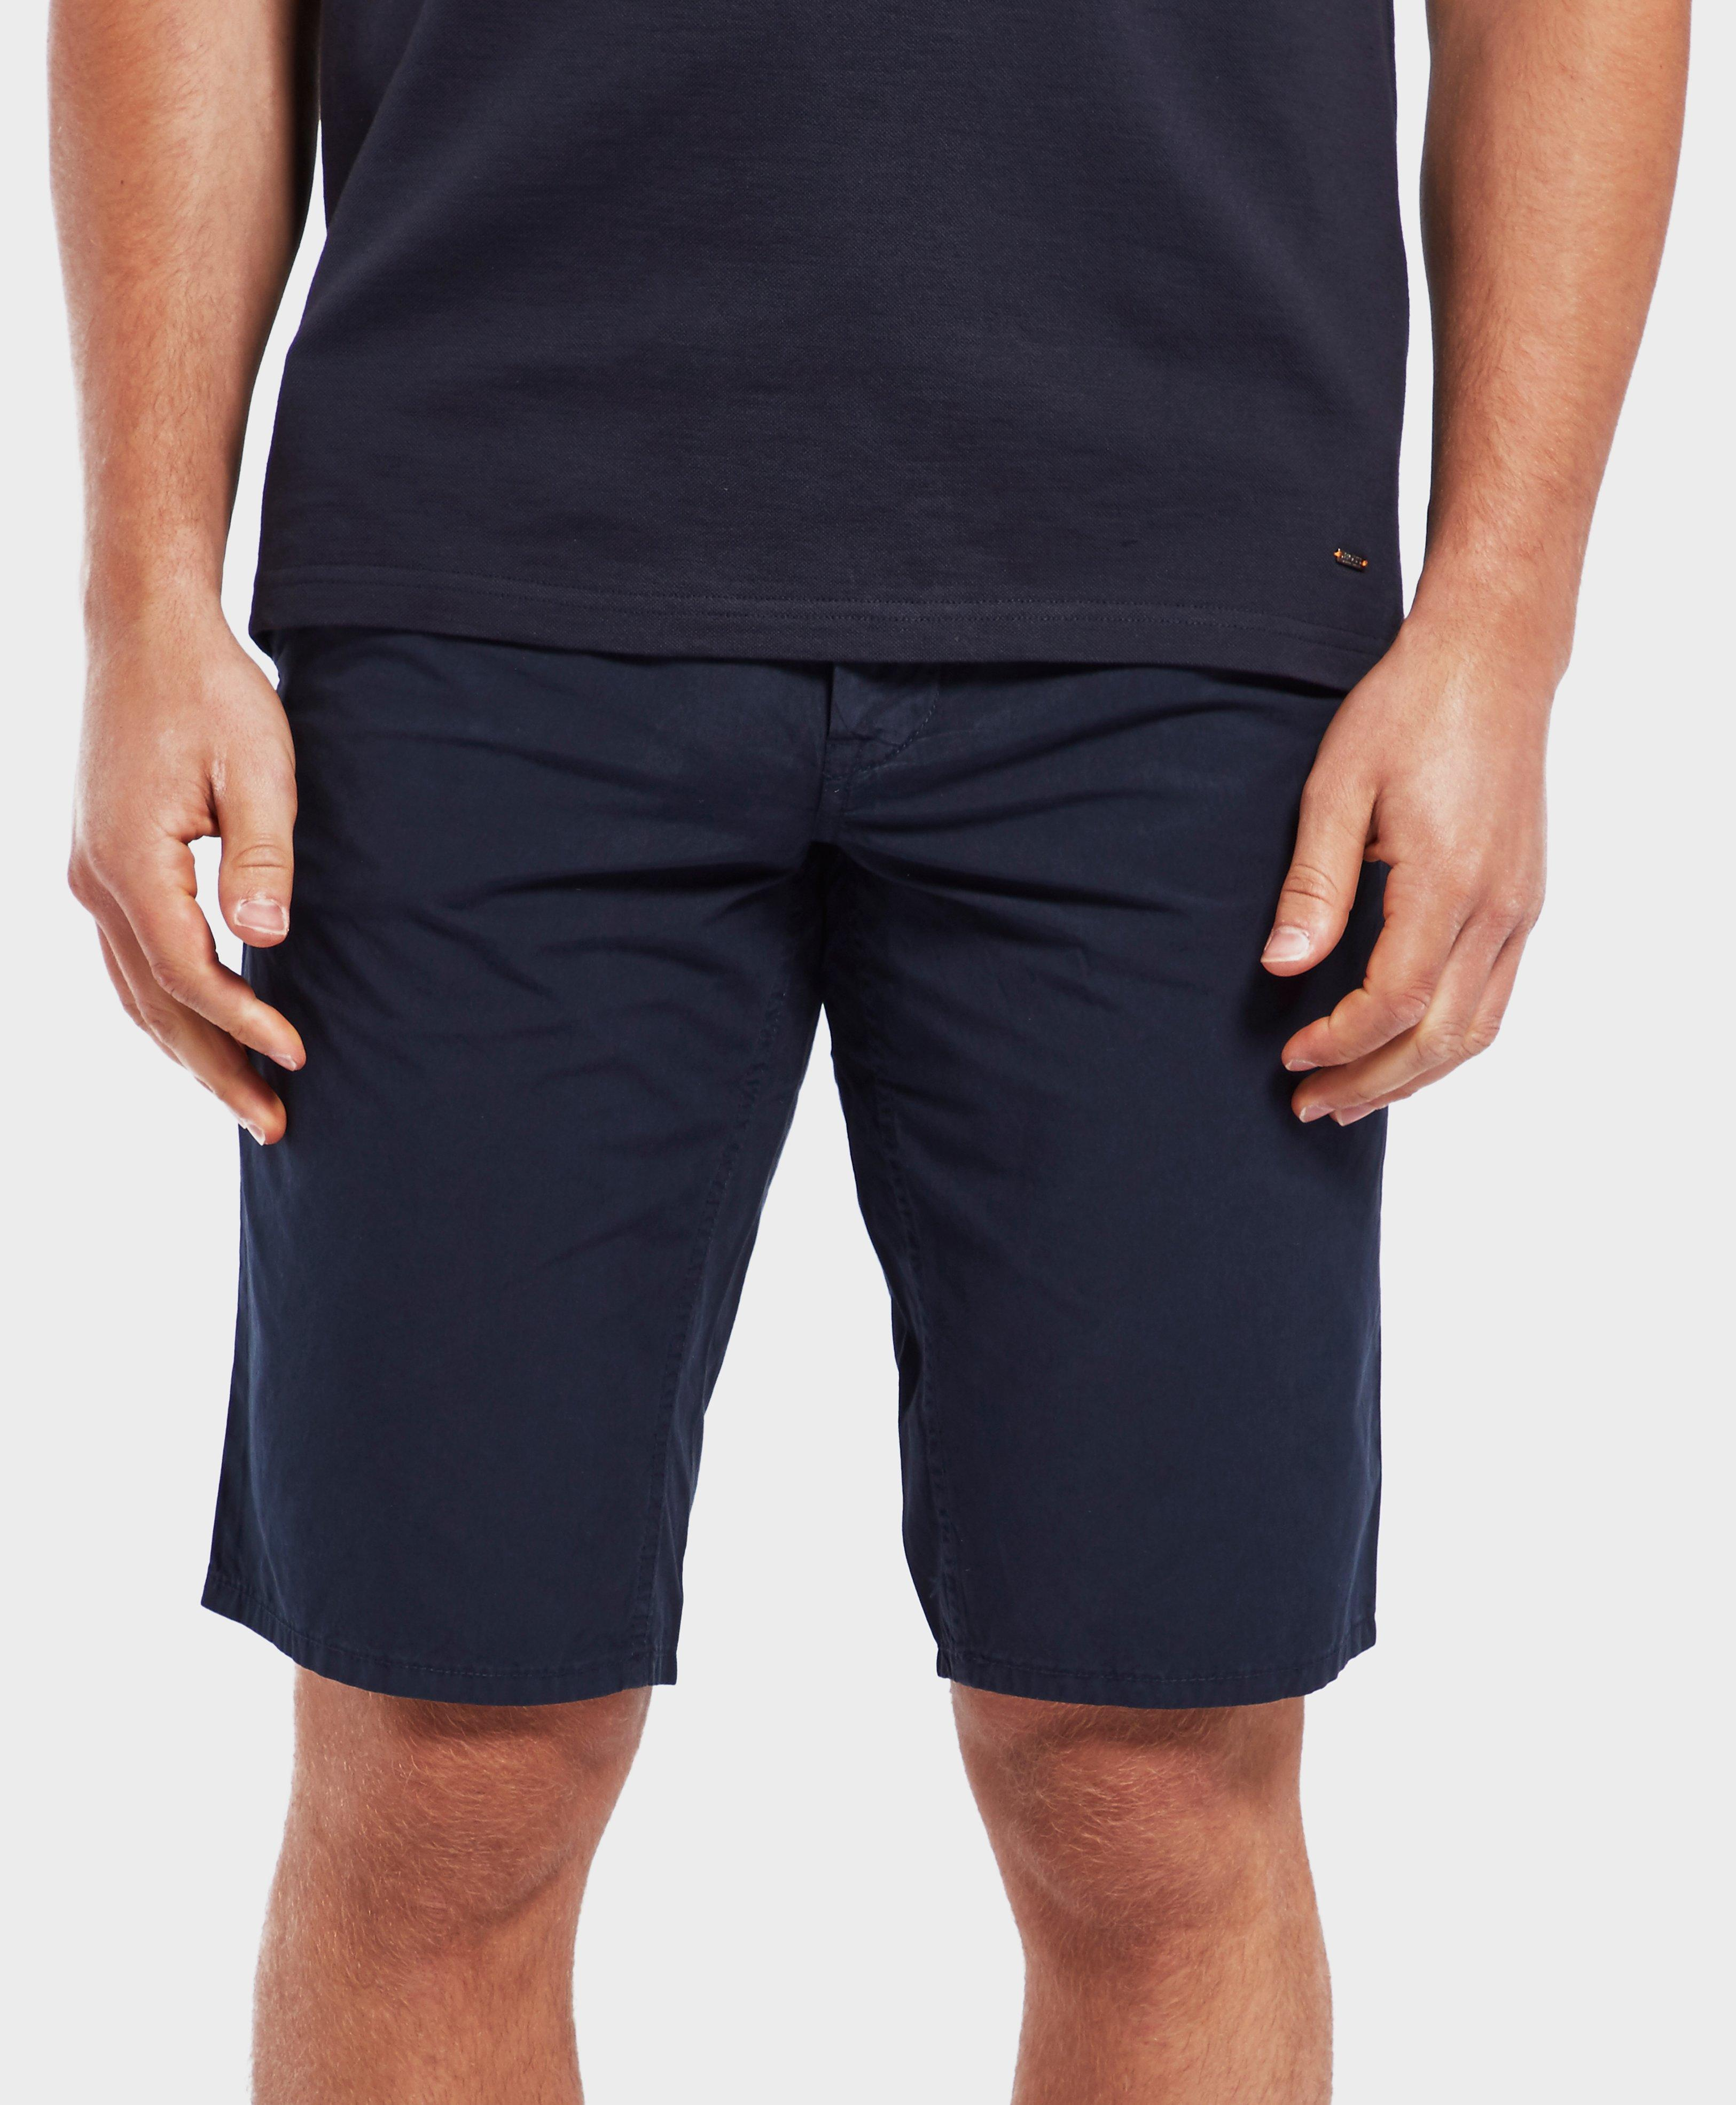 b24ebd967 Boss Schino Slim Shorts in Blue for Men - Lyst